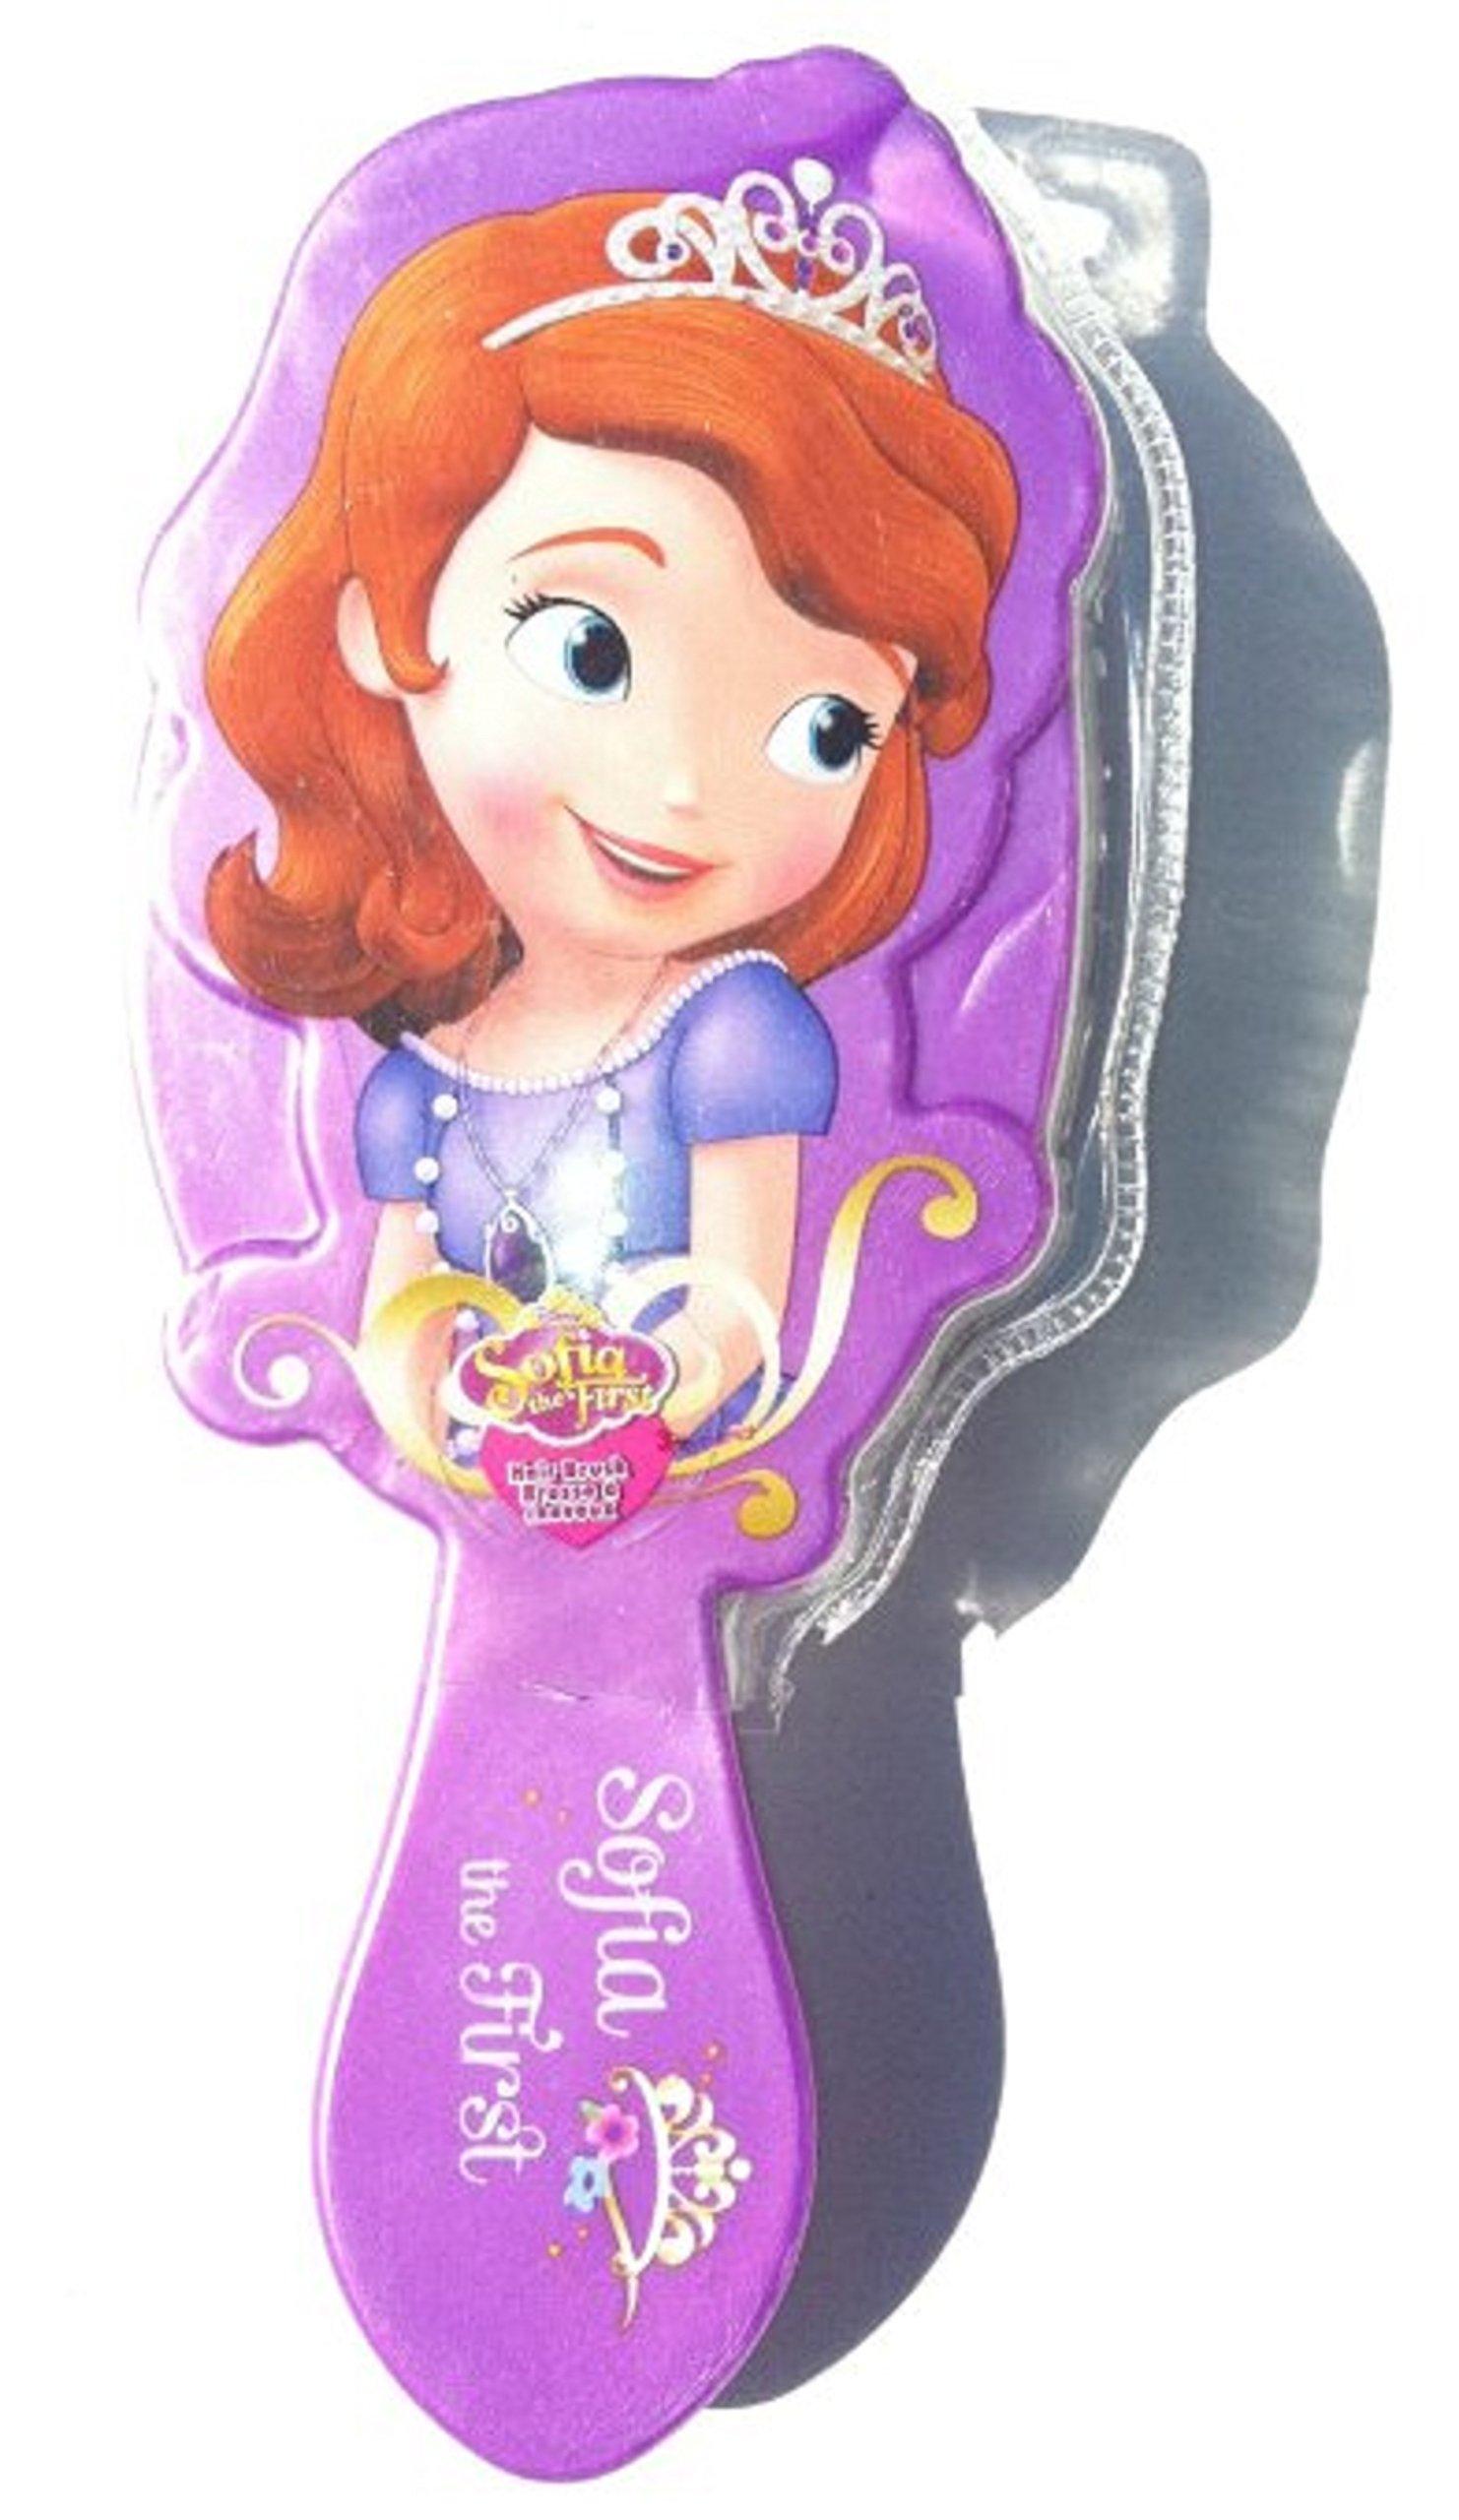 Granny's (c) Disney Pretend Play Sofia the First Princess Large Diecut Hair Brush